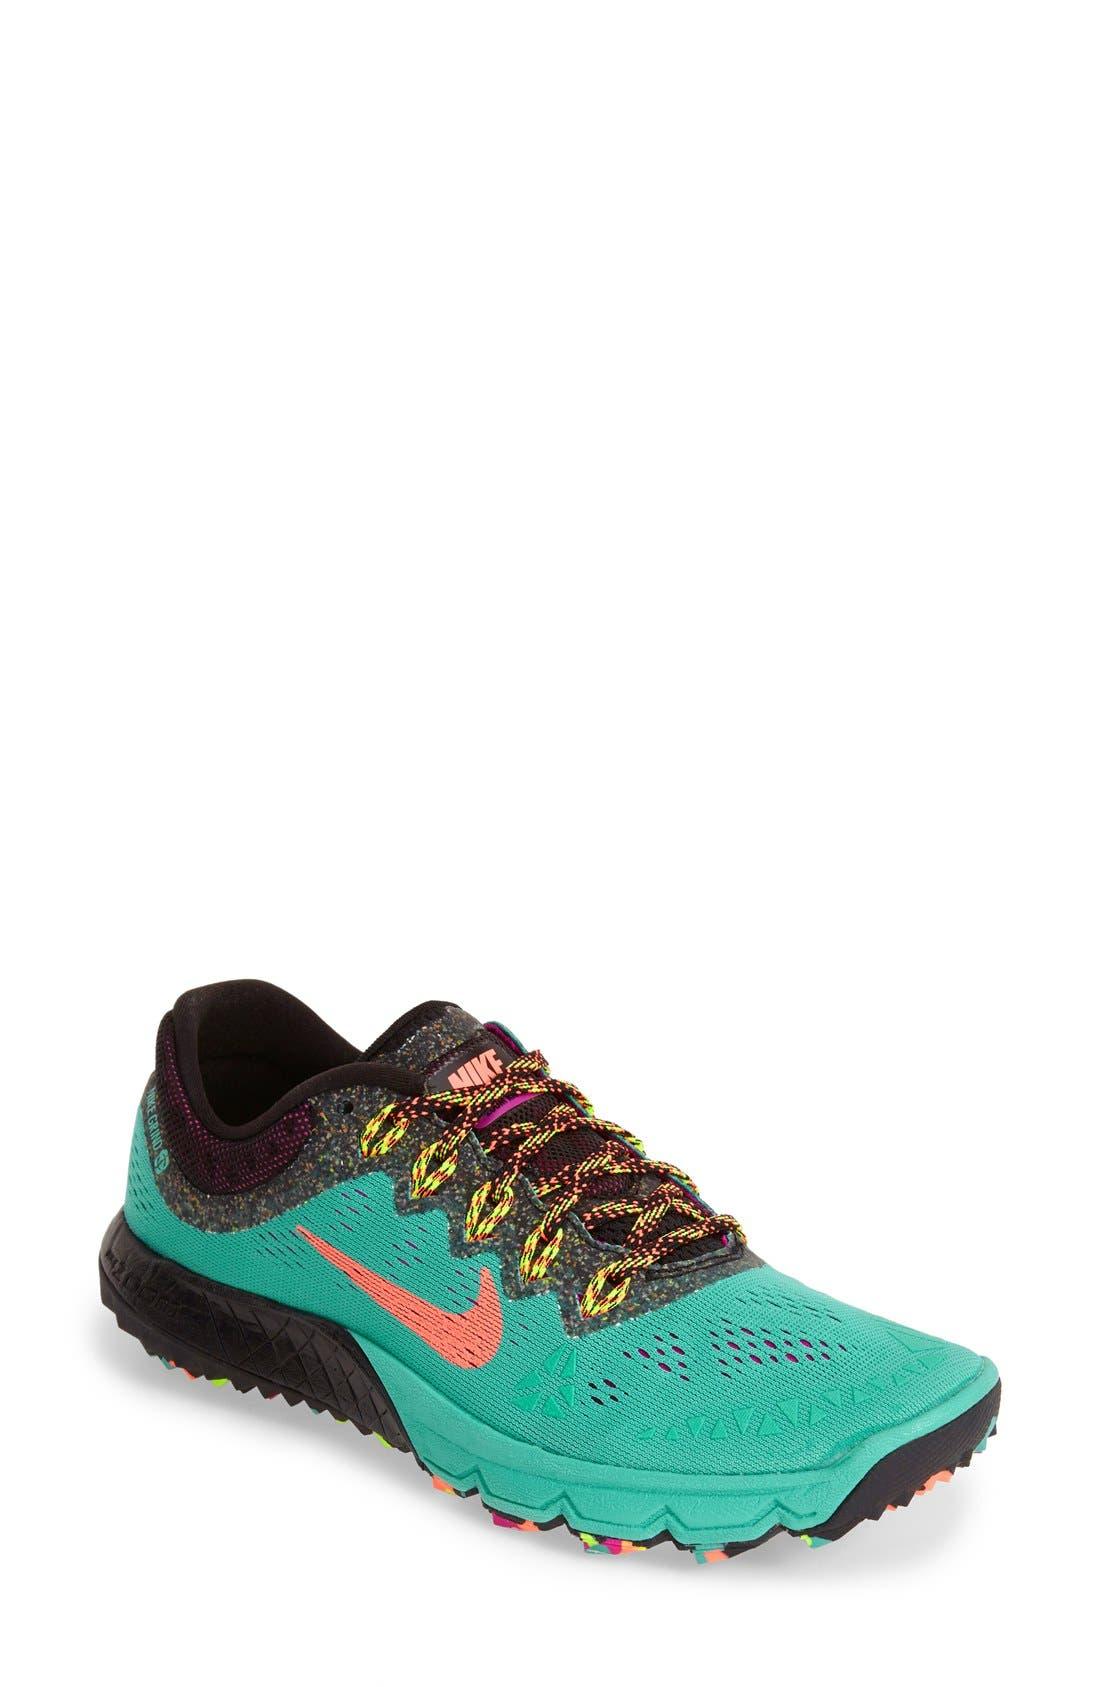 Alternate Image 1 Selected - Nike 'Zoom Terra Kiger' Trail Running Shoe (Women)